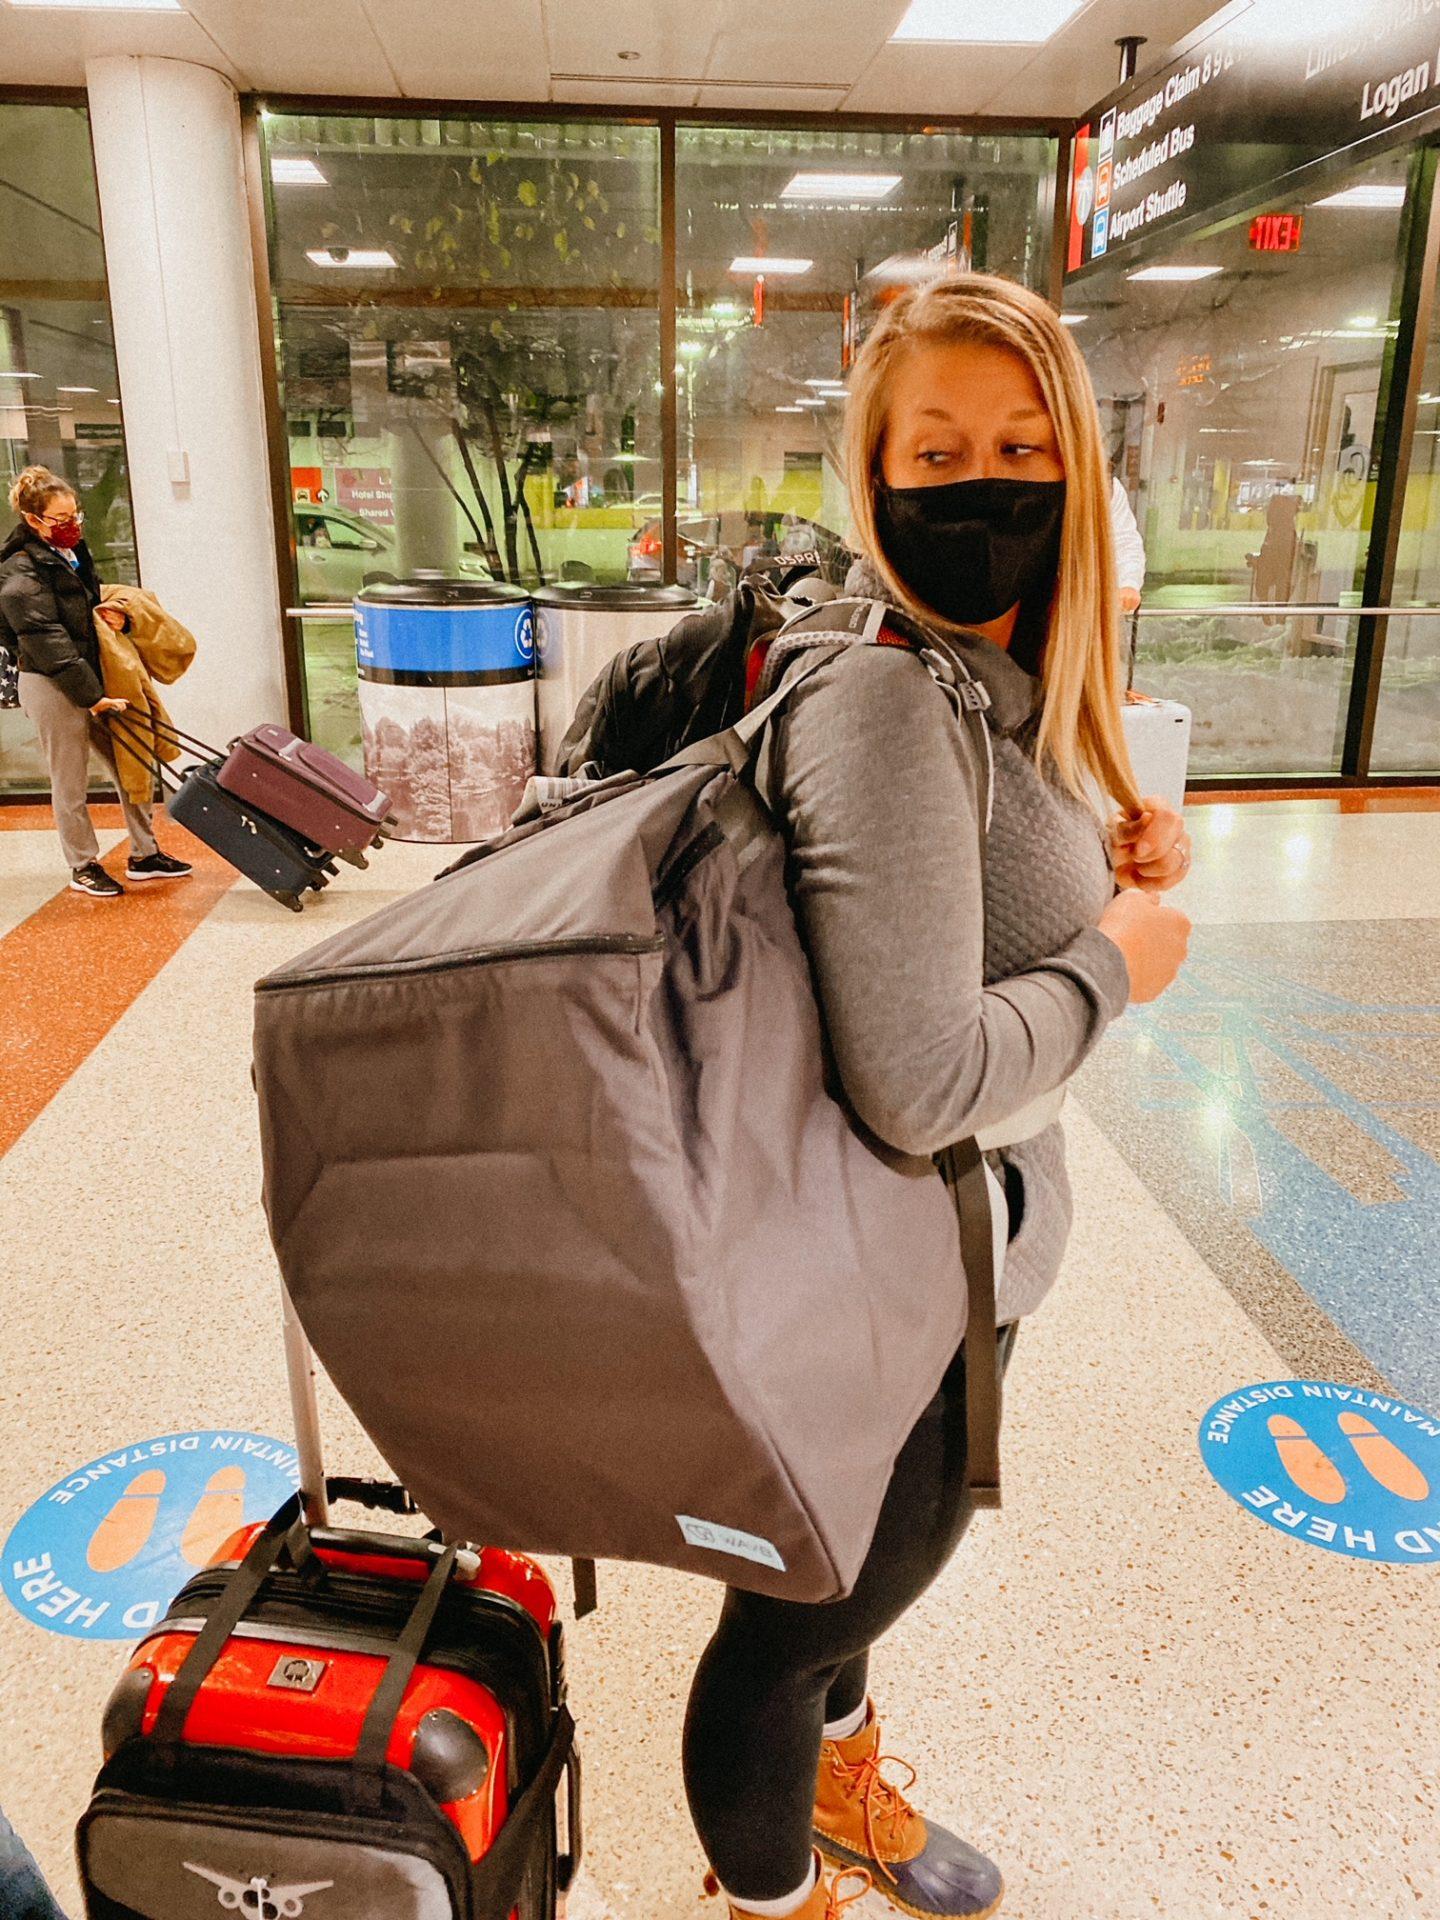 wayb travel car seat safety